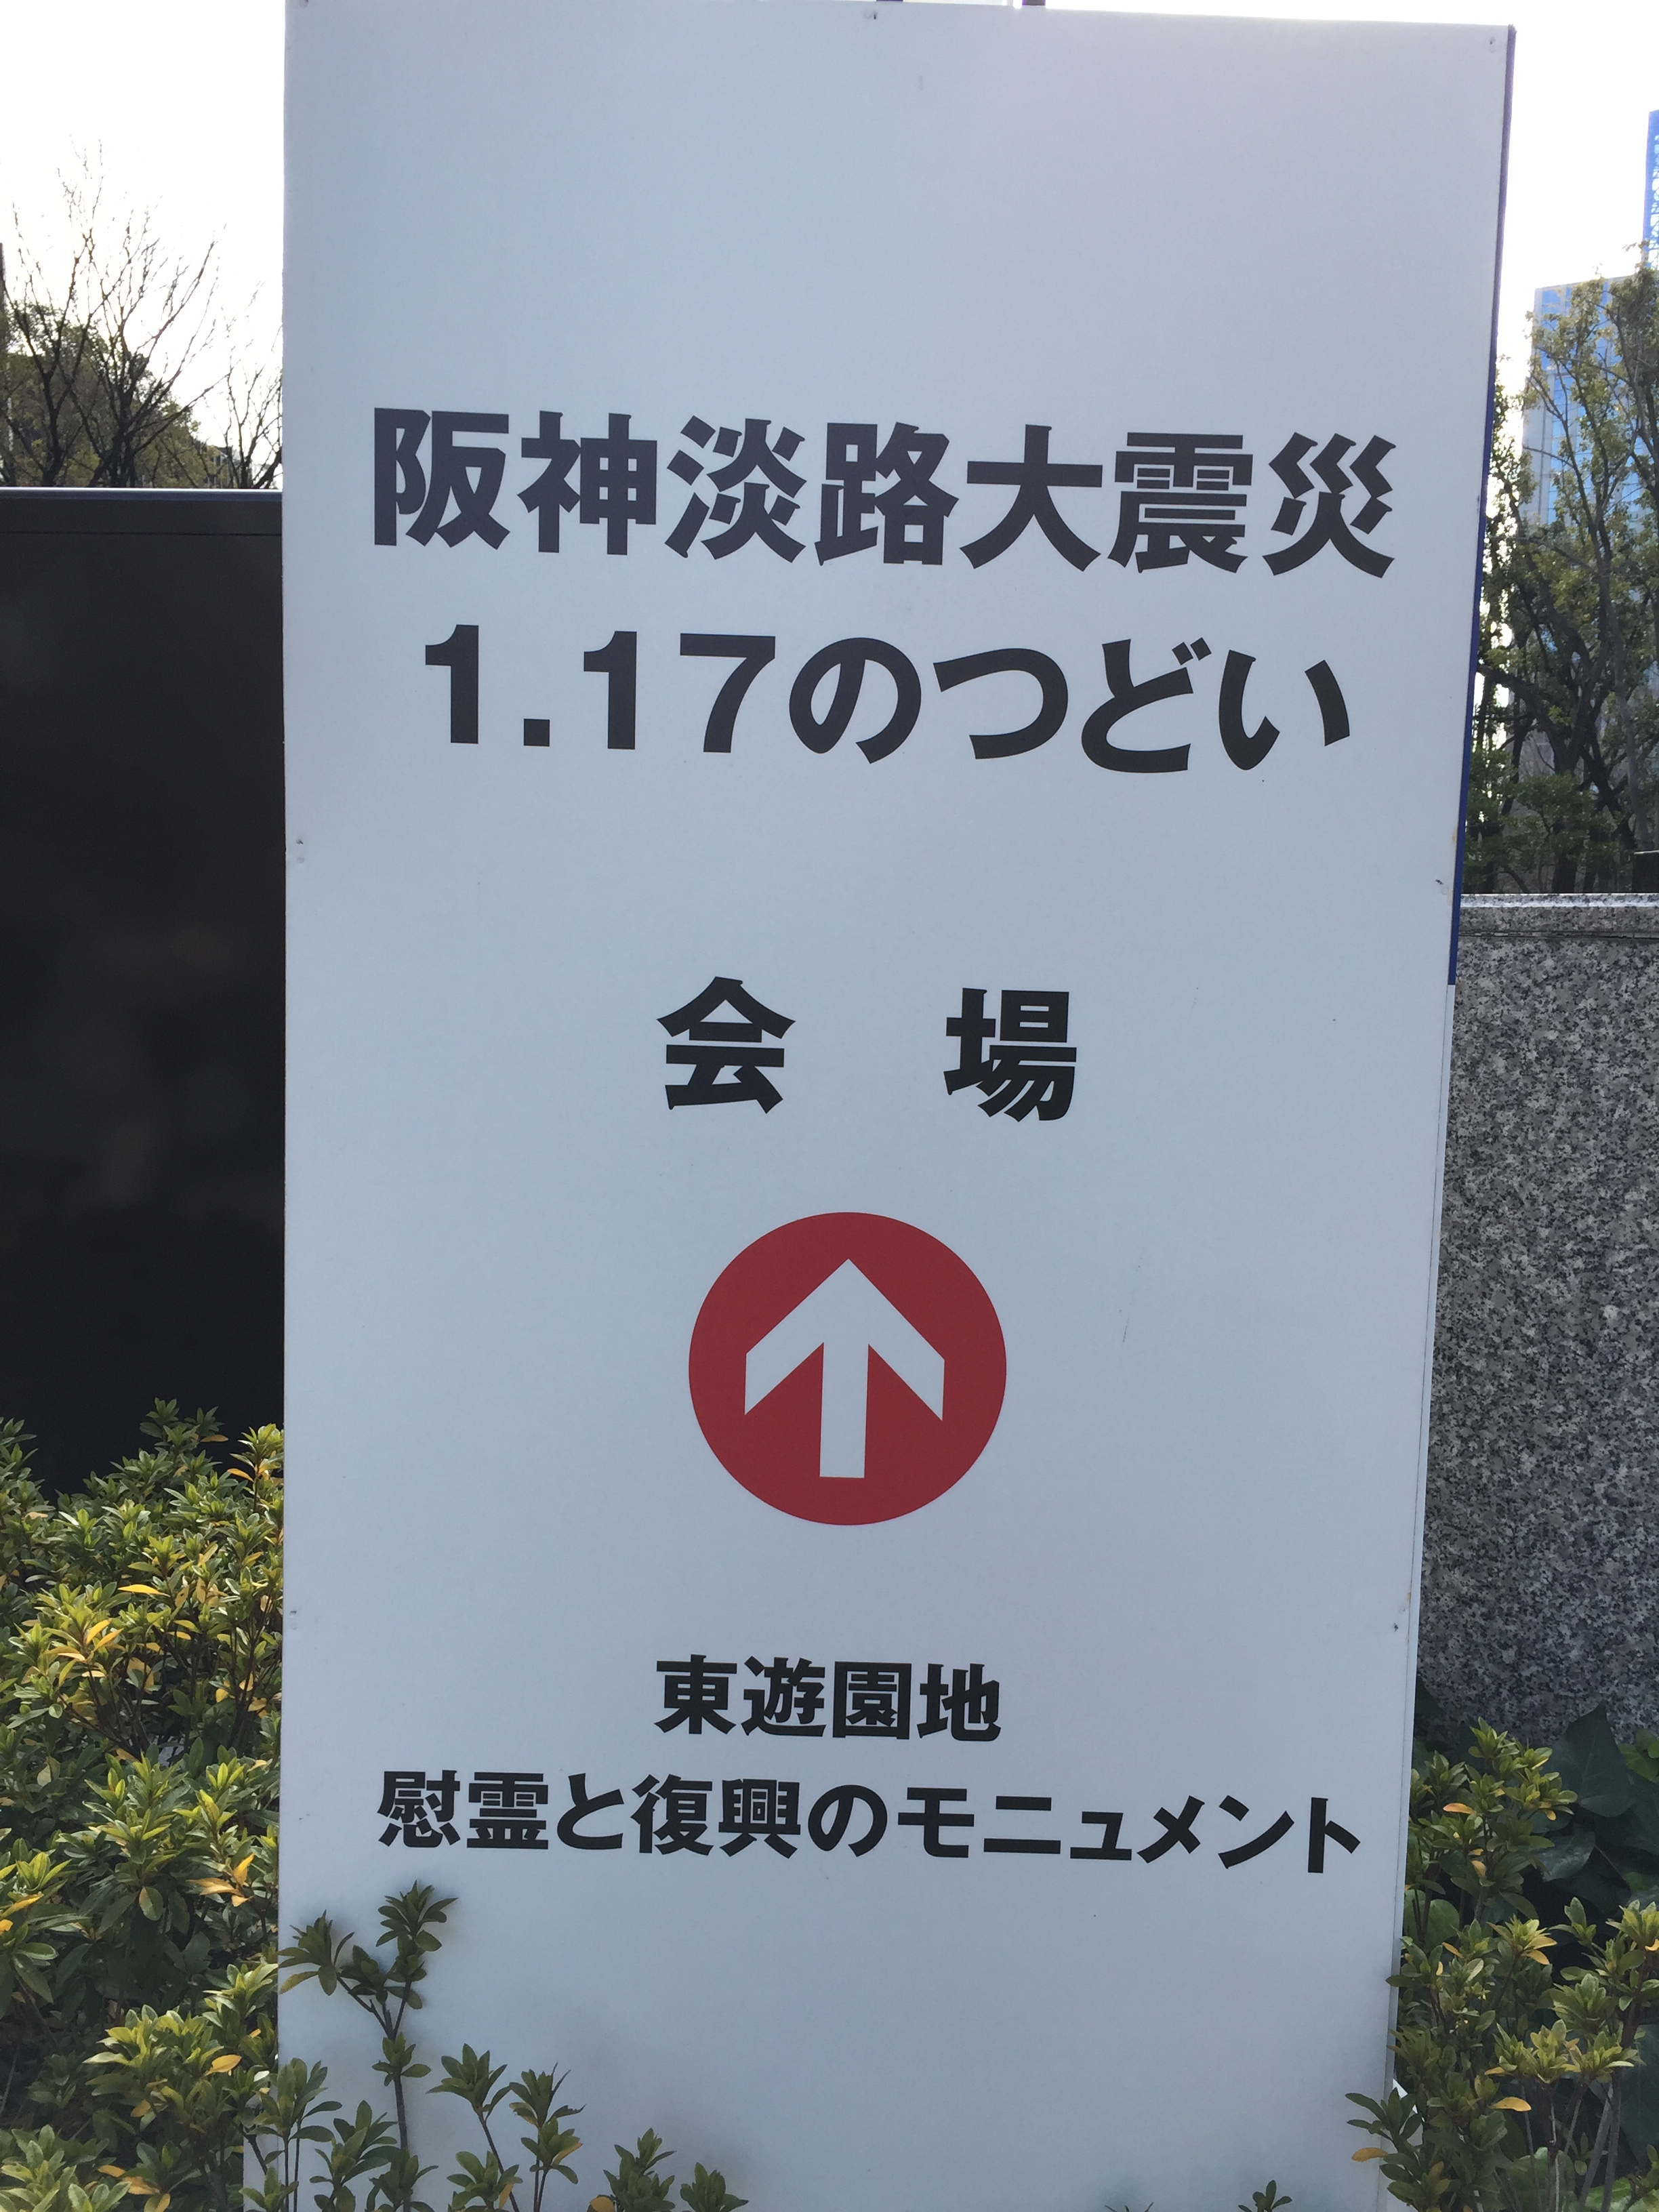 2017-01-17 11.06.39